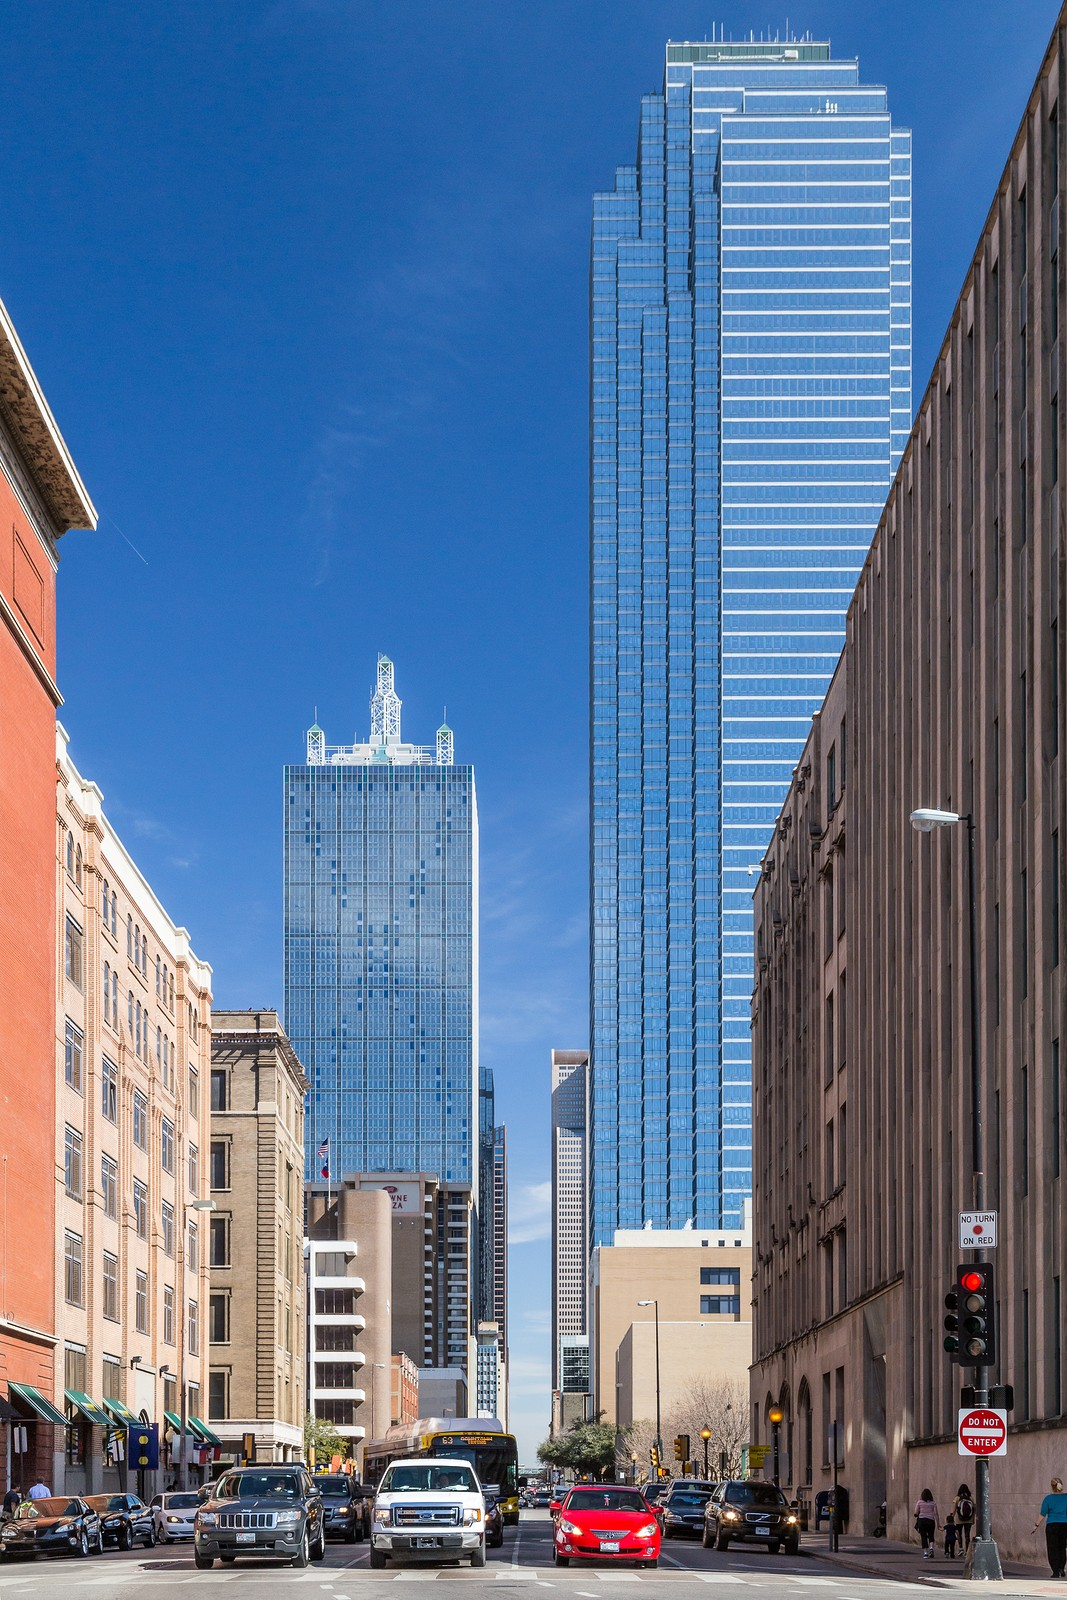 Elm Street in Downtown Dallas Texas